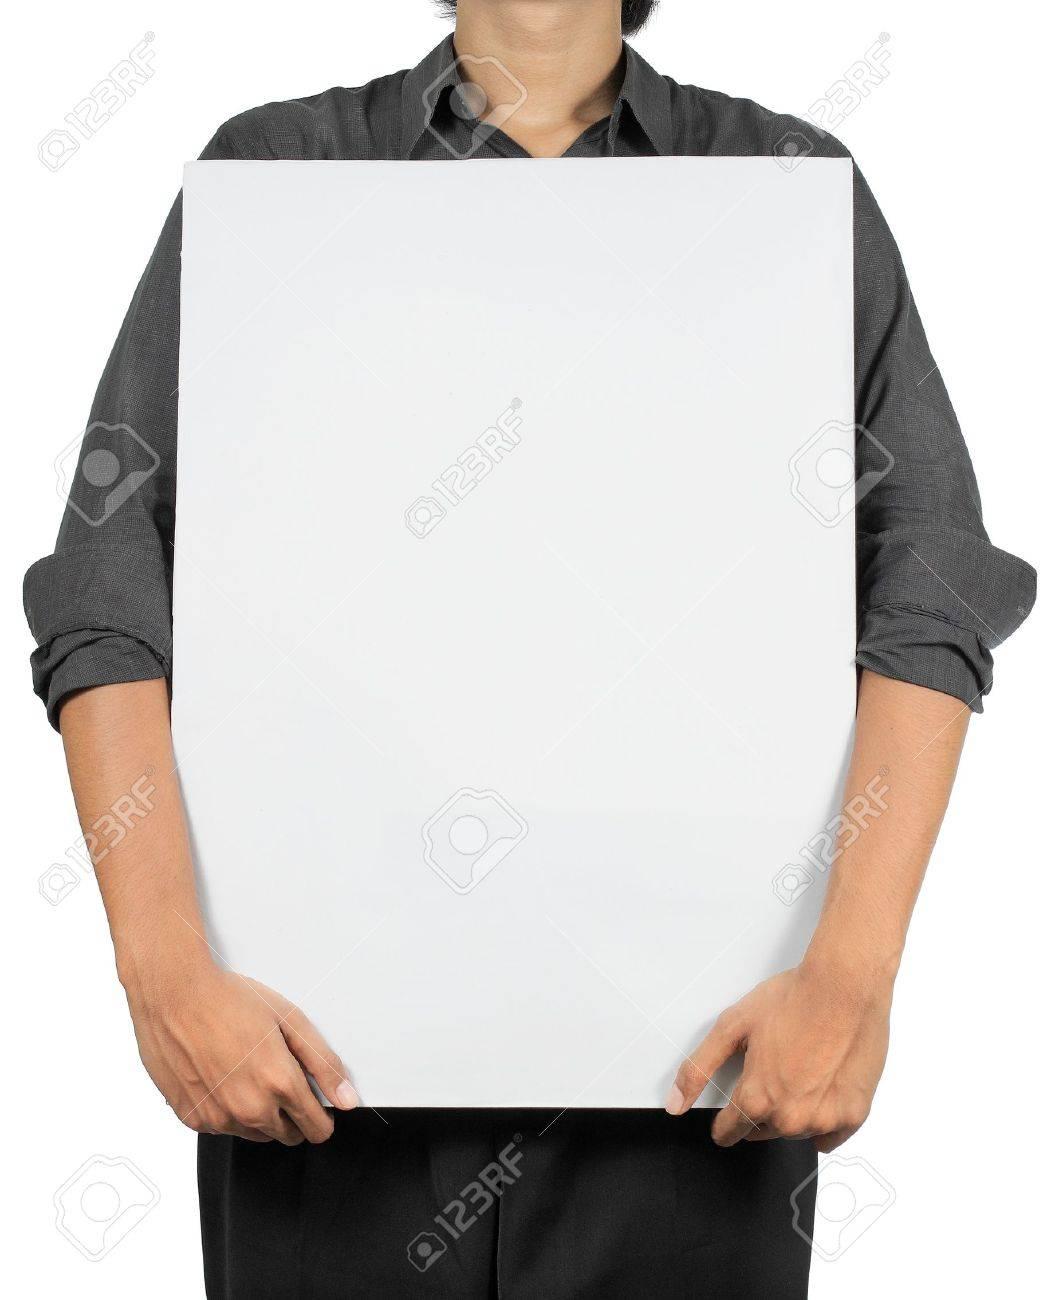 man holding blank white board Stock Photo - 8696728